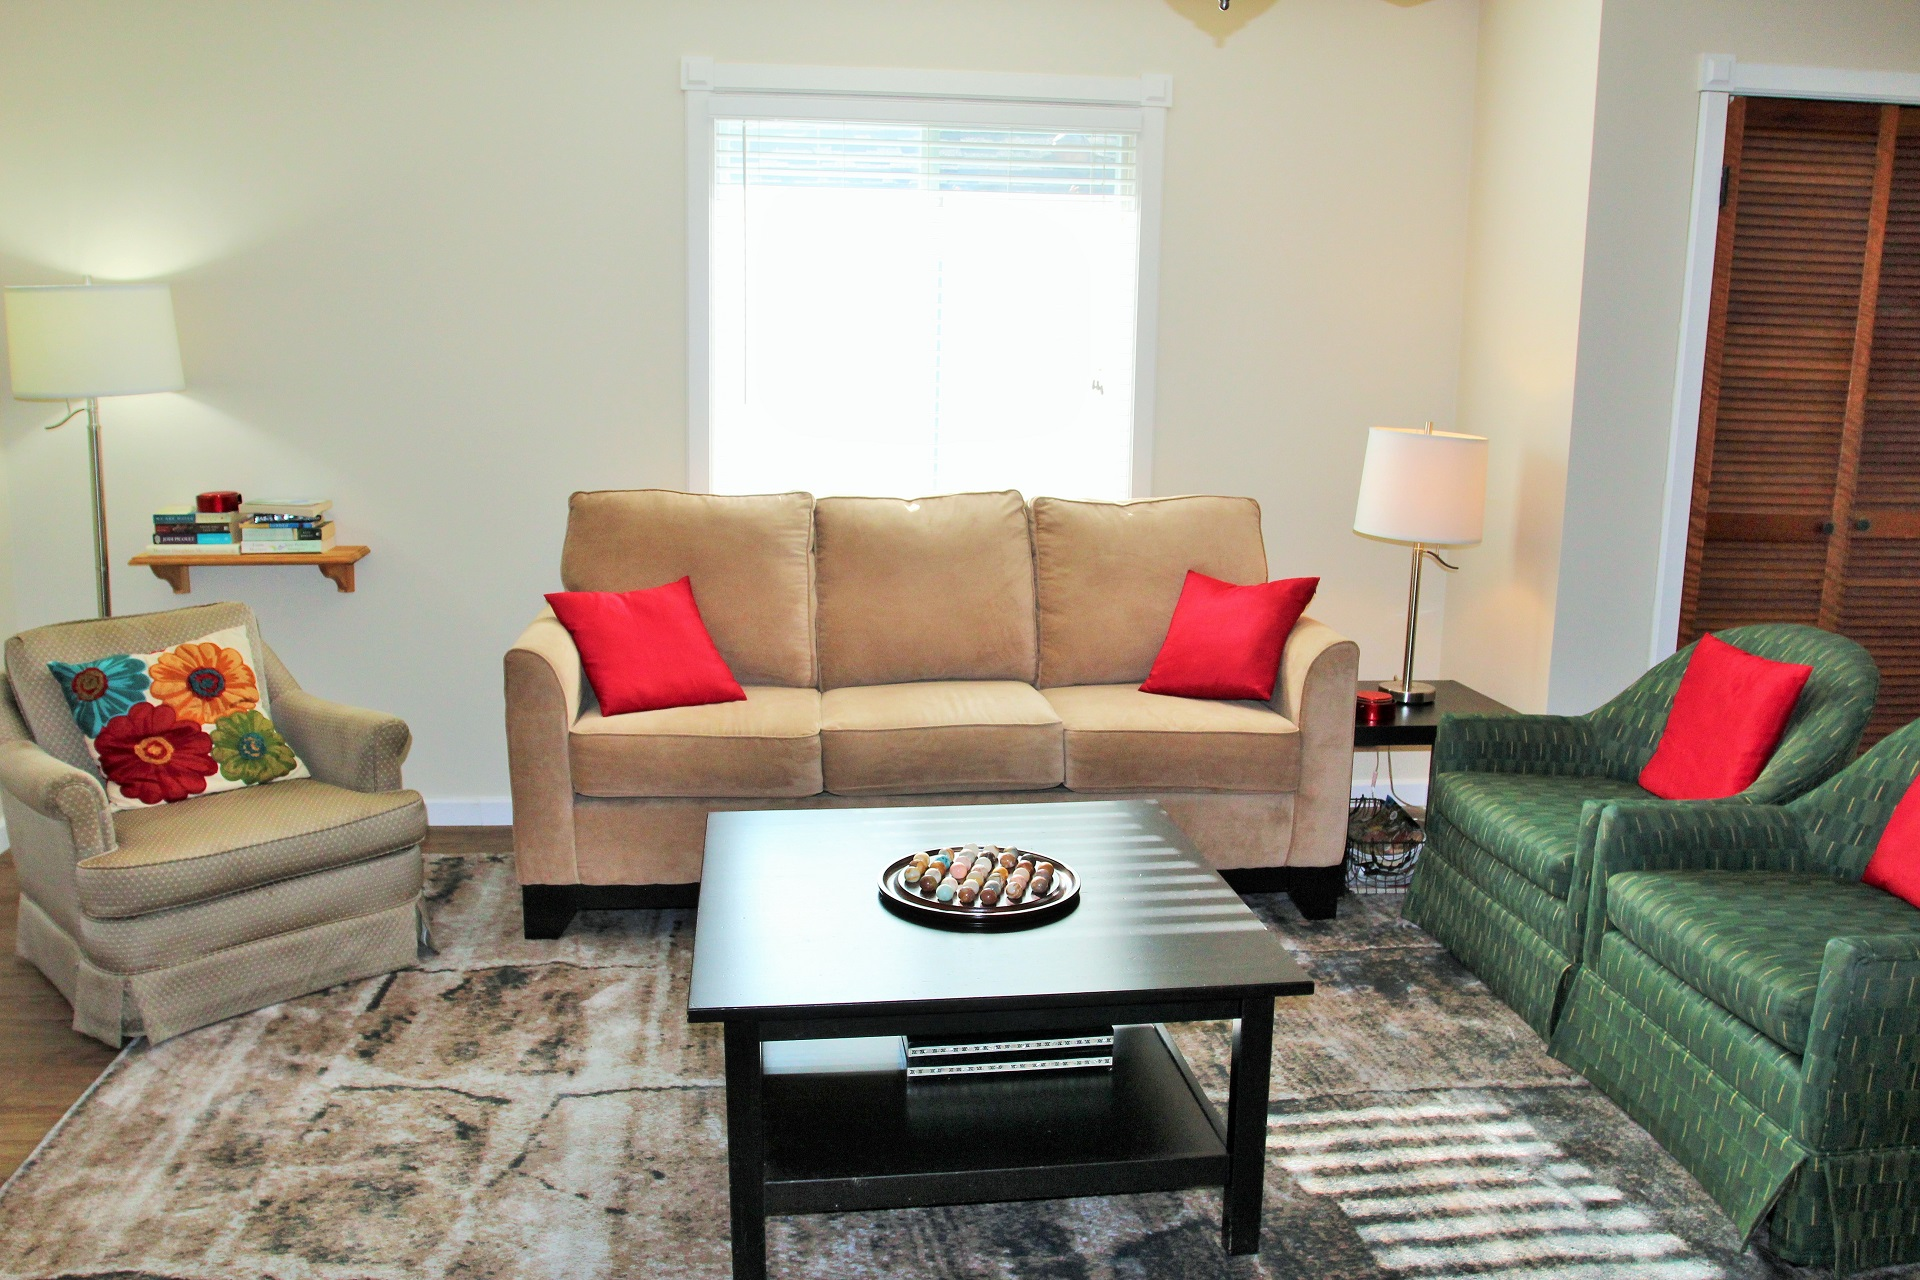 BeebalmCottage-livingroom2-CrystalBeach-HolidayHomesPropertyManagement